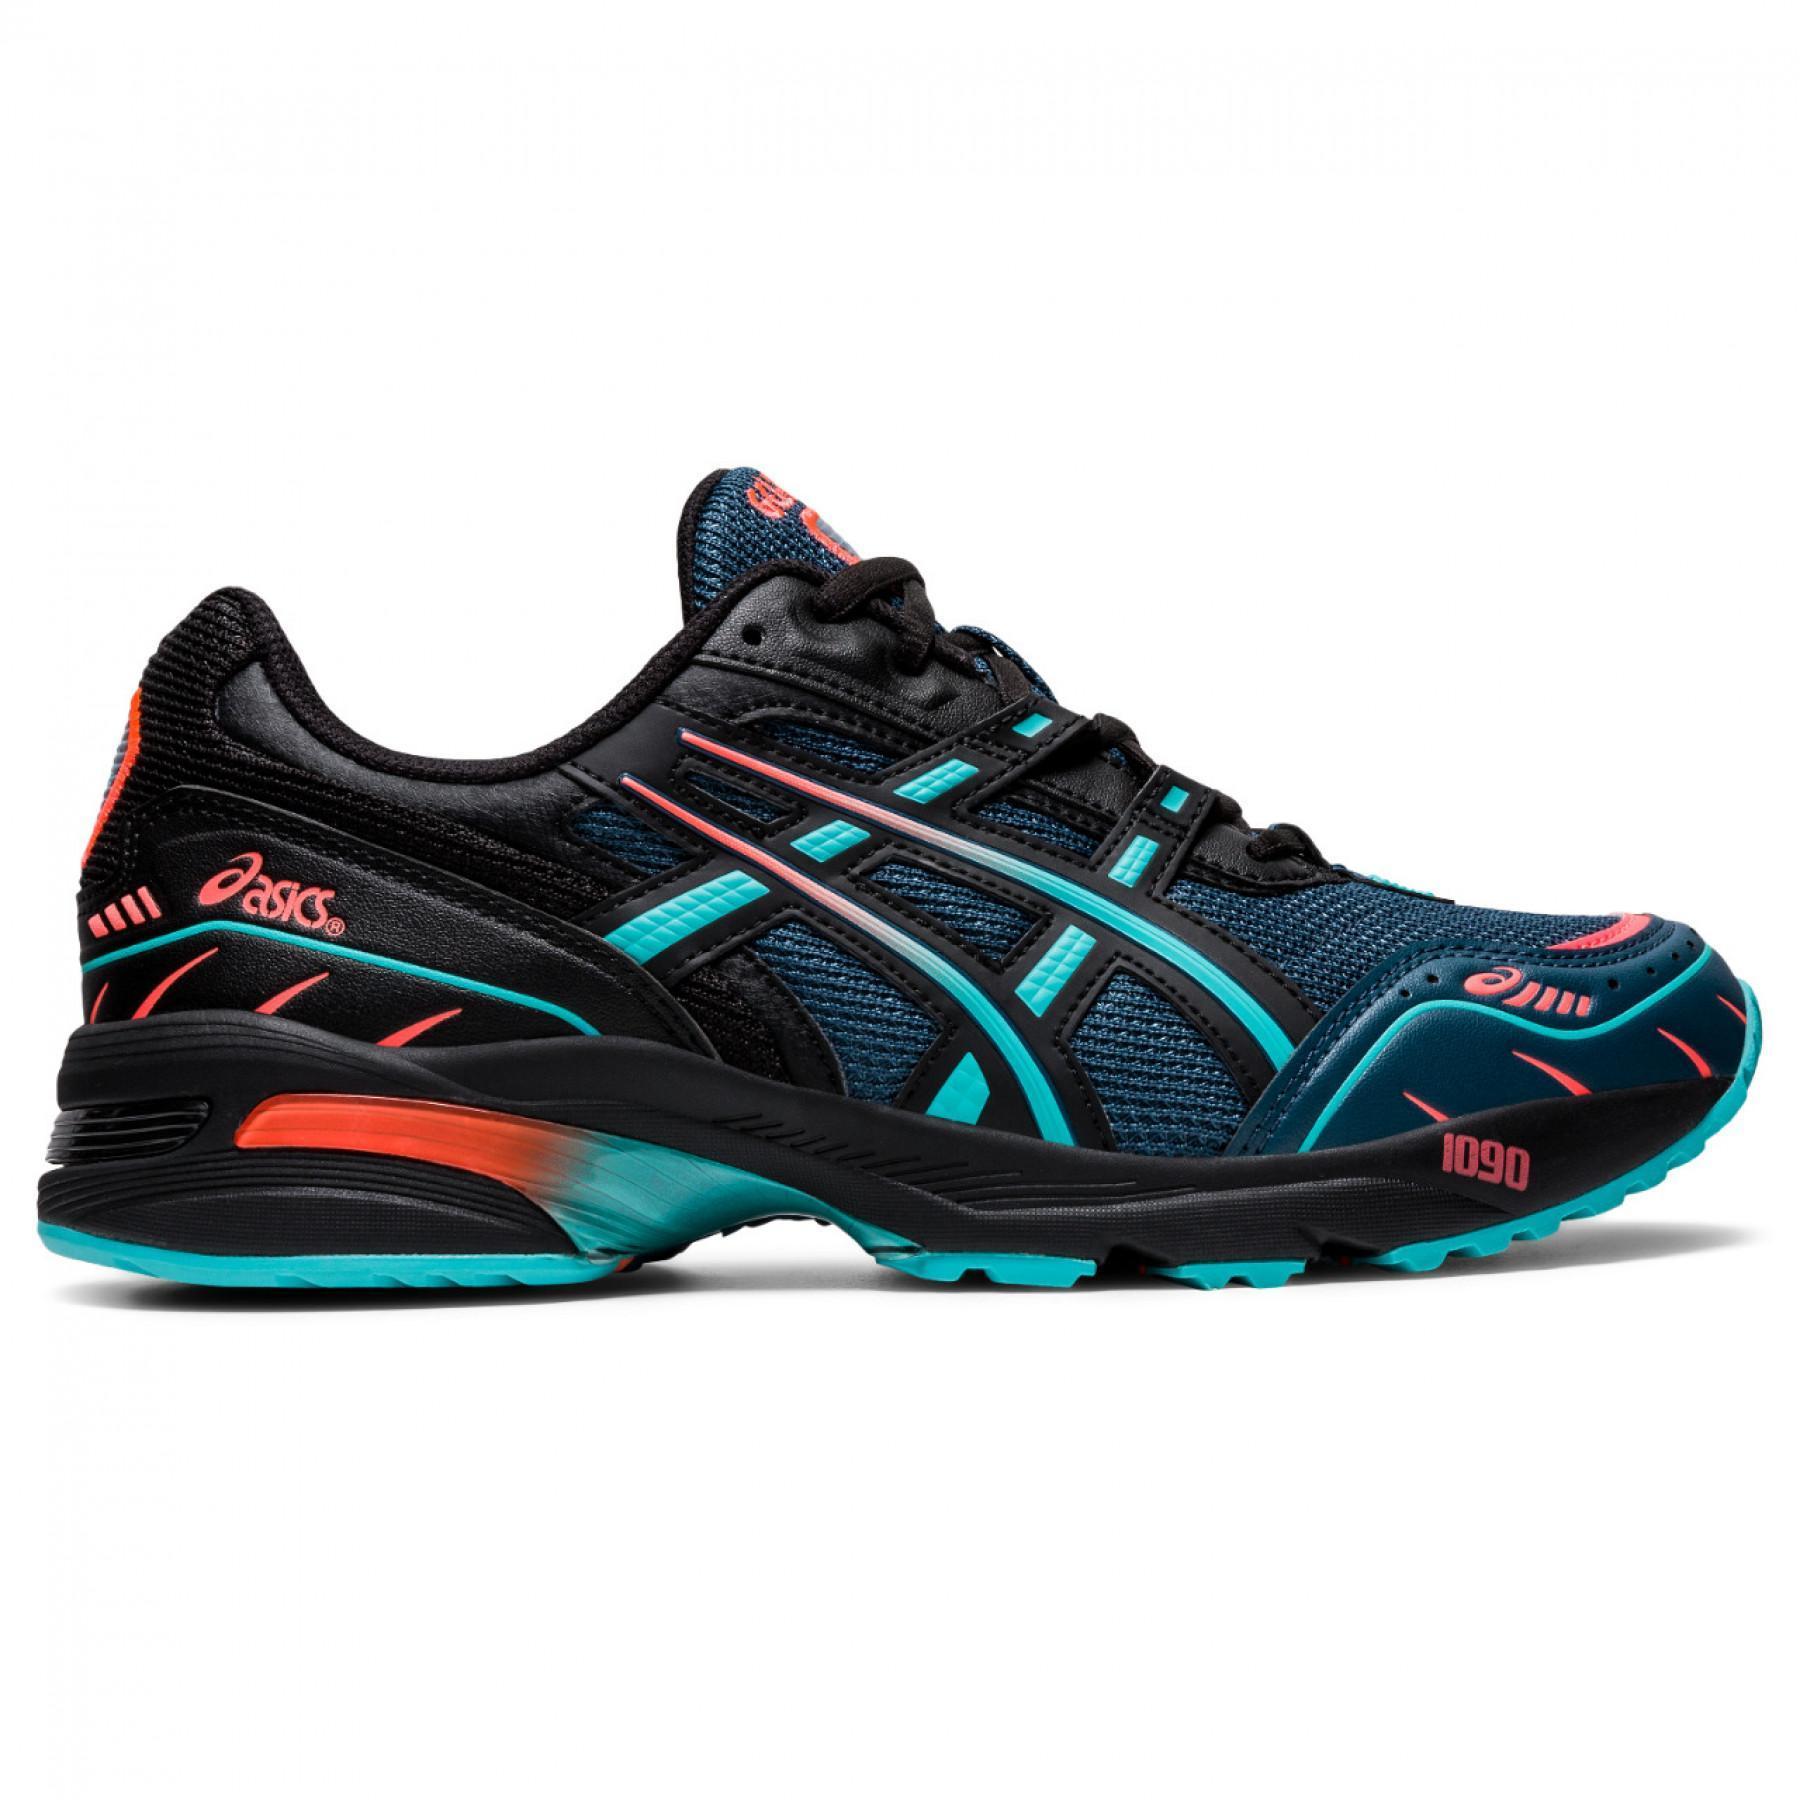 Chaussures Asics Gel-1090 Magnetic Blue Black